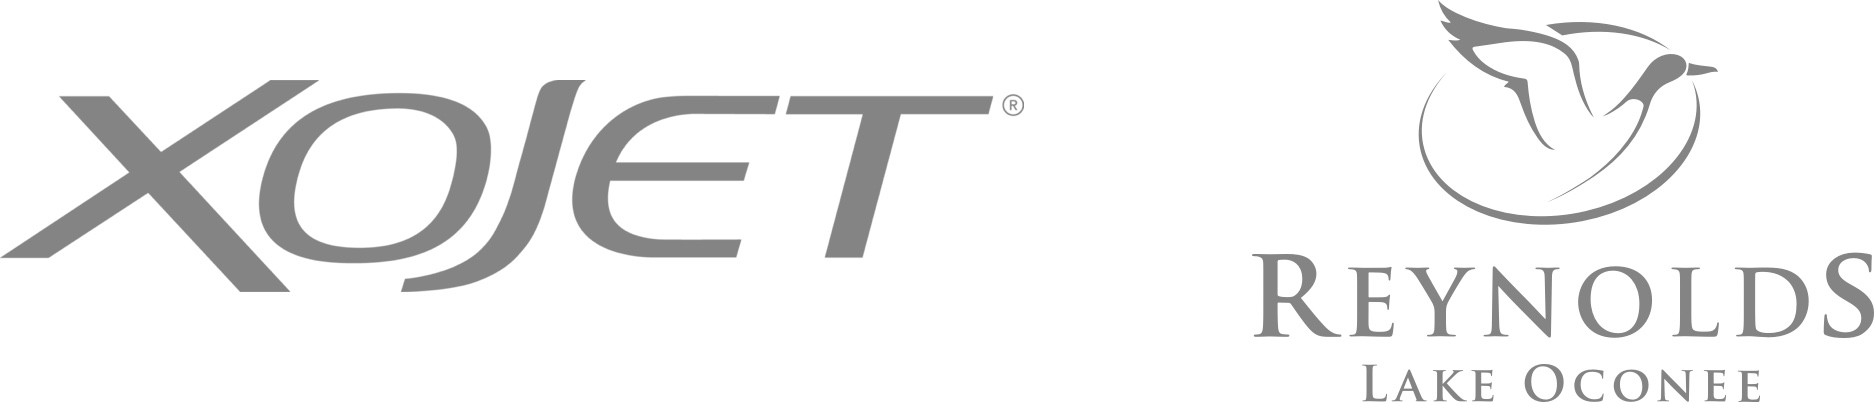 XOJET and Reynolds Lake Oconee logos